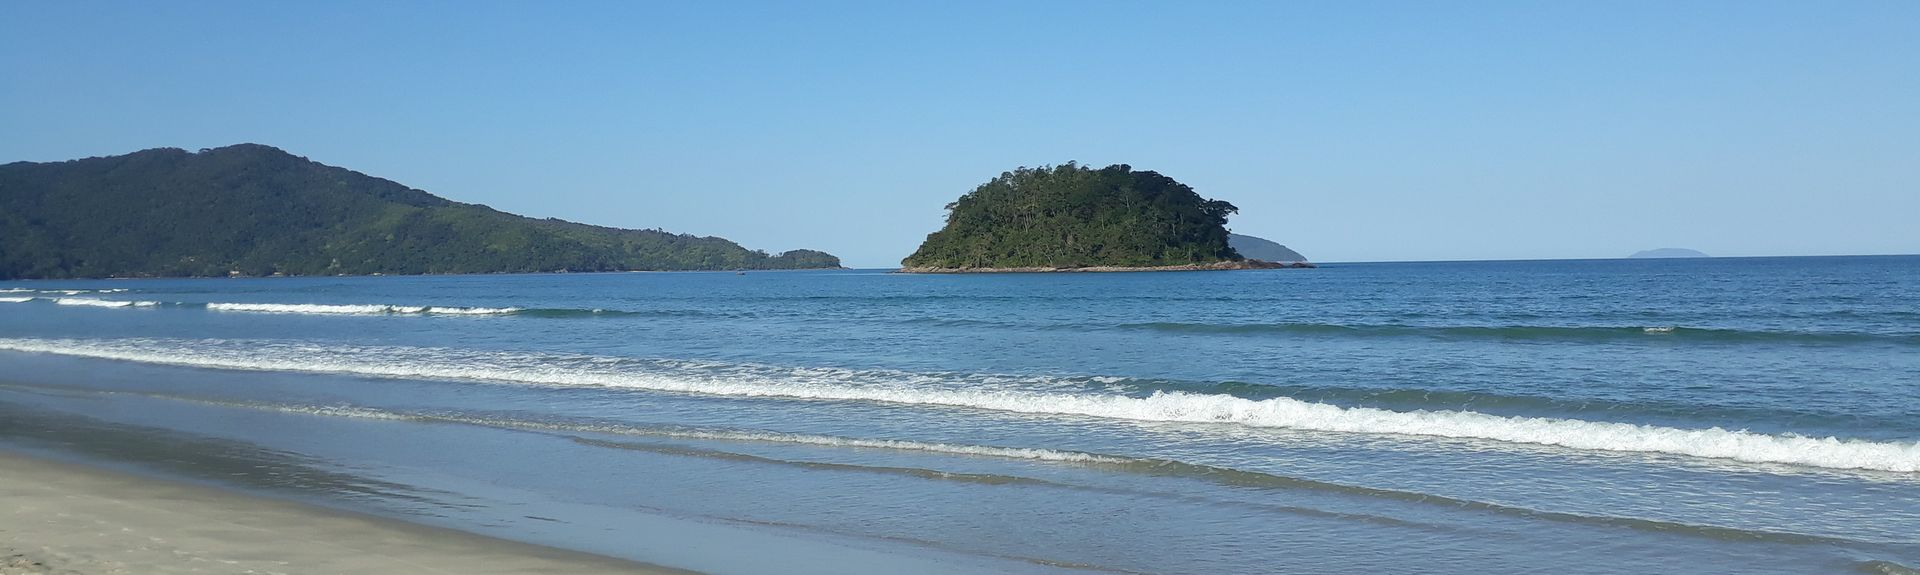 Itagua Beach, Ubatuba, Southeast Region, Brazil